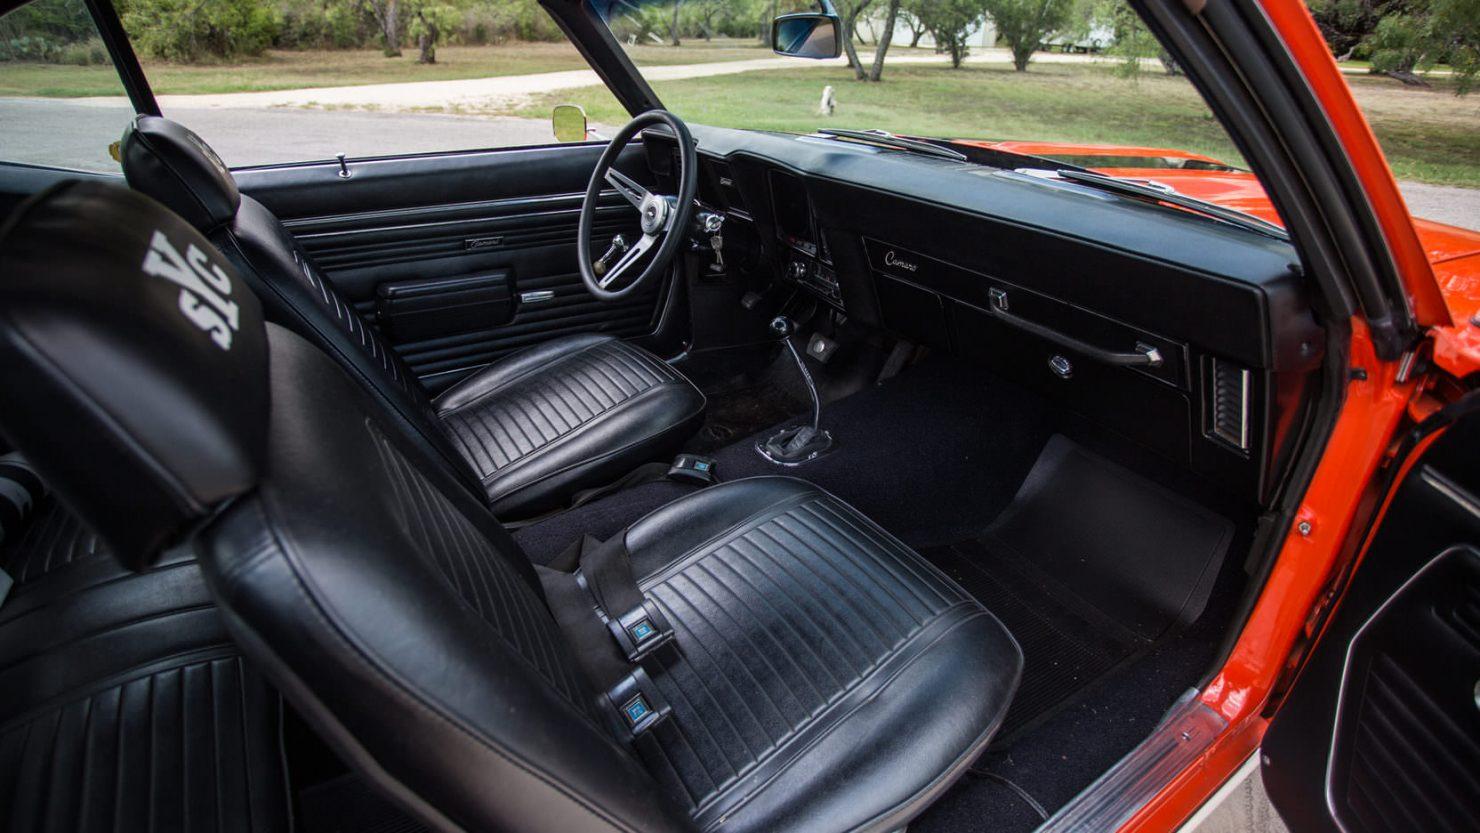 Chevrolet Yenko Camaro 9 1480x833 - 1969 Chevrolet Yenko Camaro